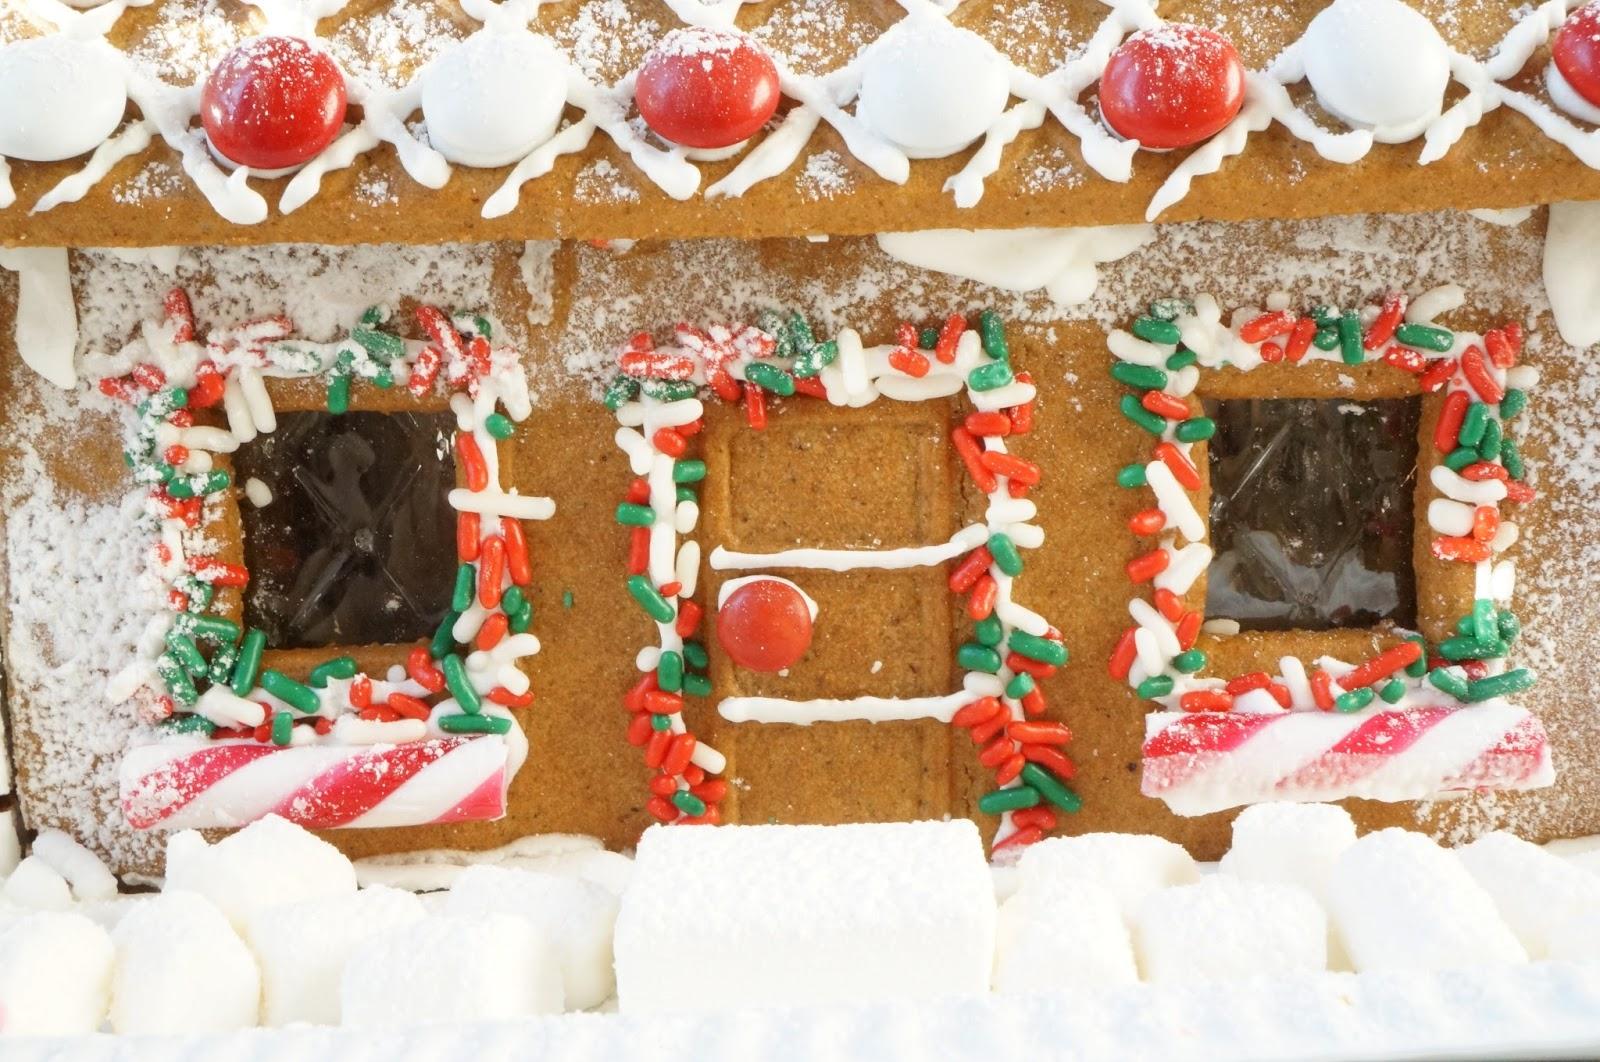 Casetta Di Natale Ikea : Casetta di pan di zenzero adesso è natale cucchiaio di stelle